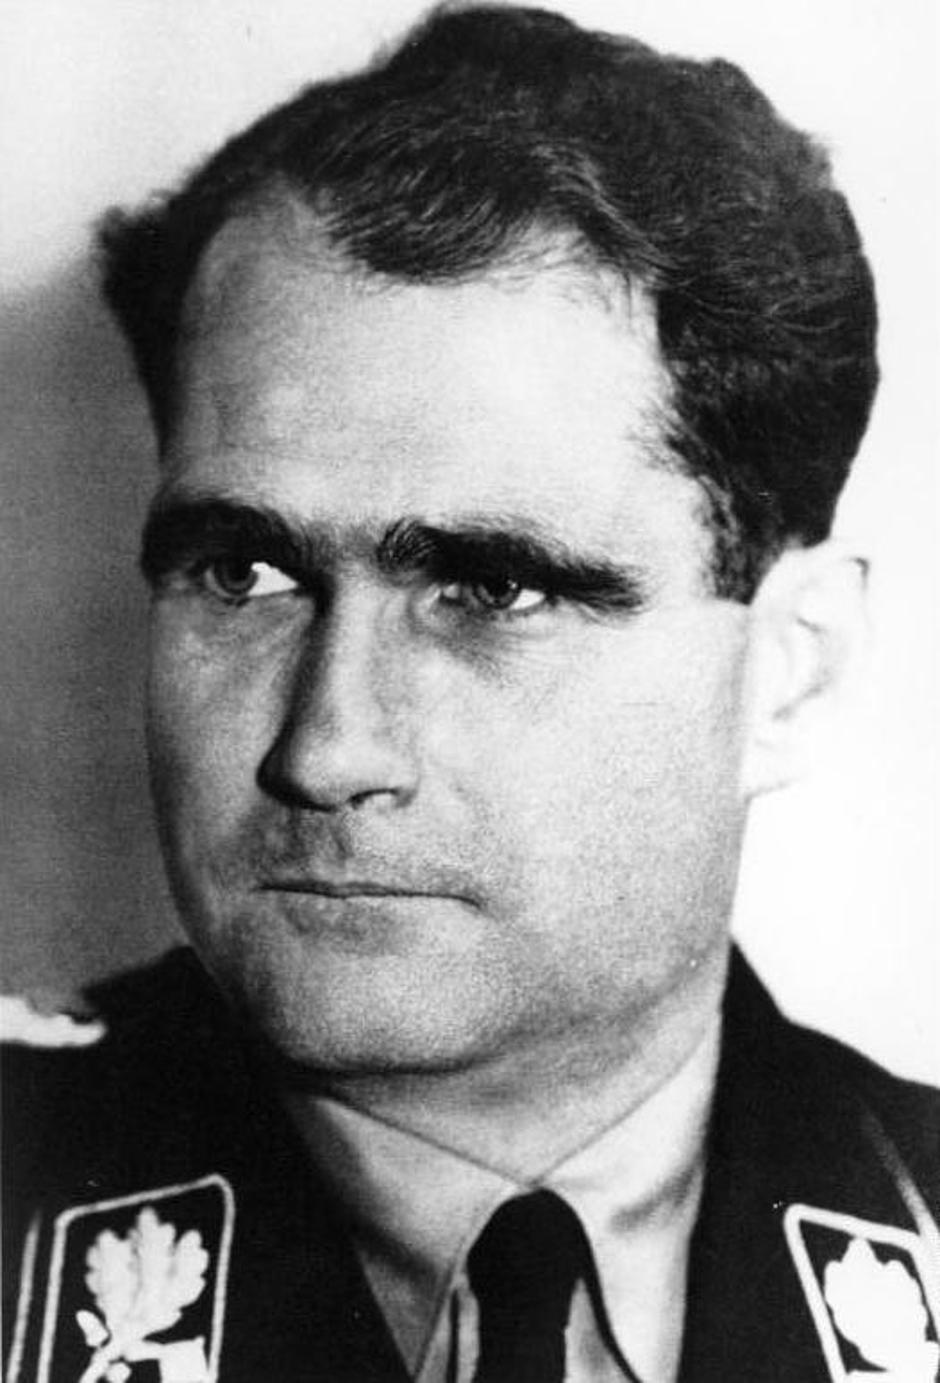 Rudolf Hess | Author: Wikipedia